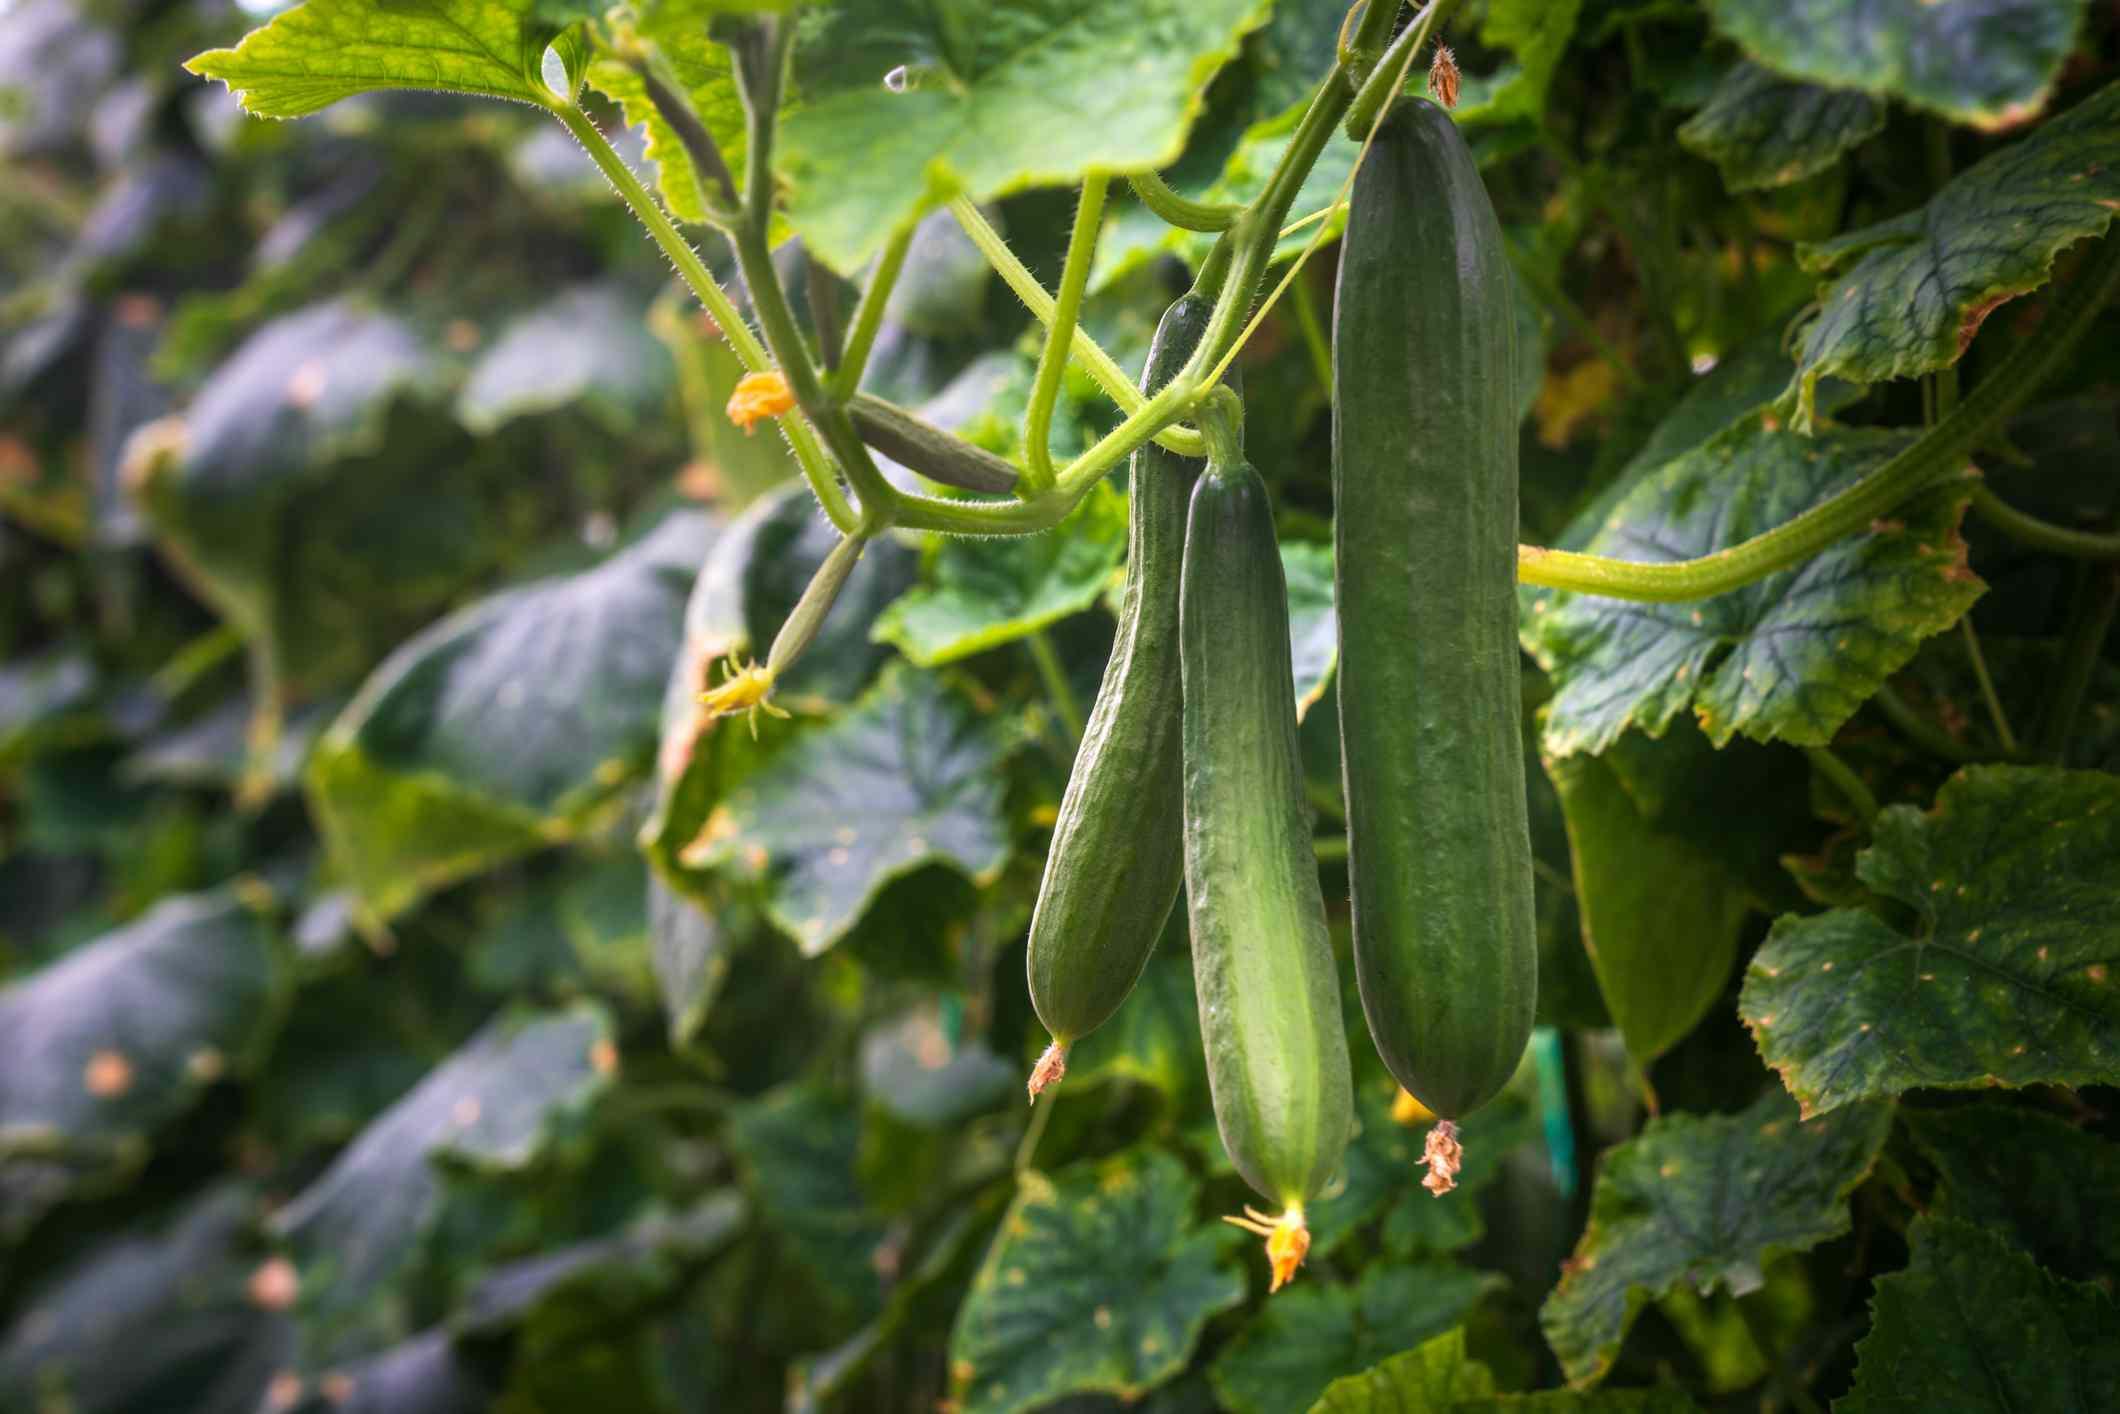 Cucumber grown in a greenhouse